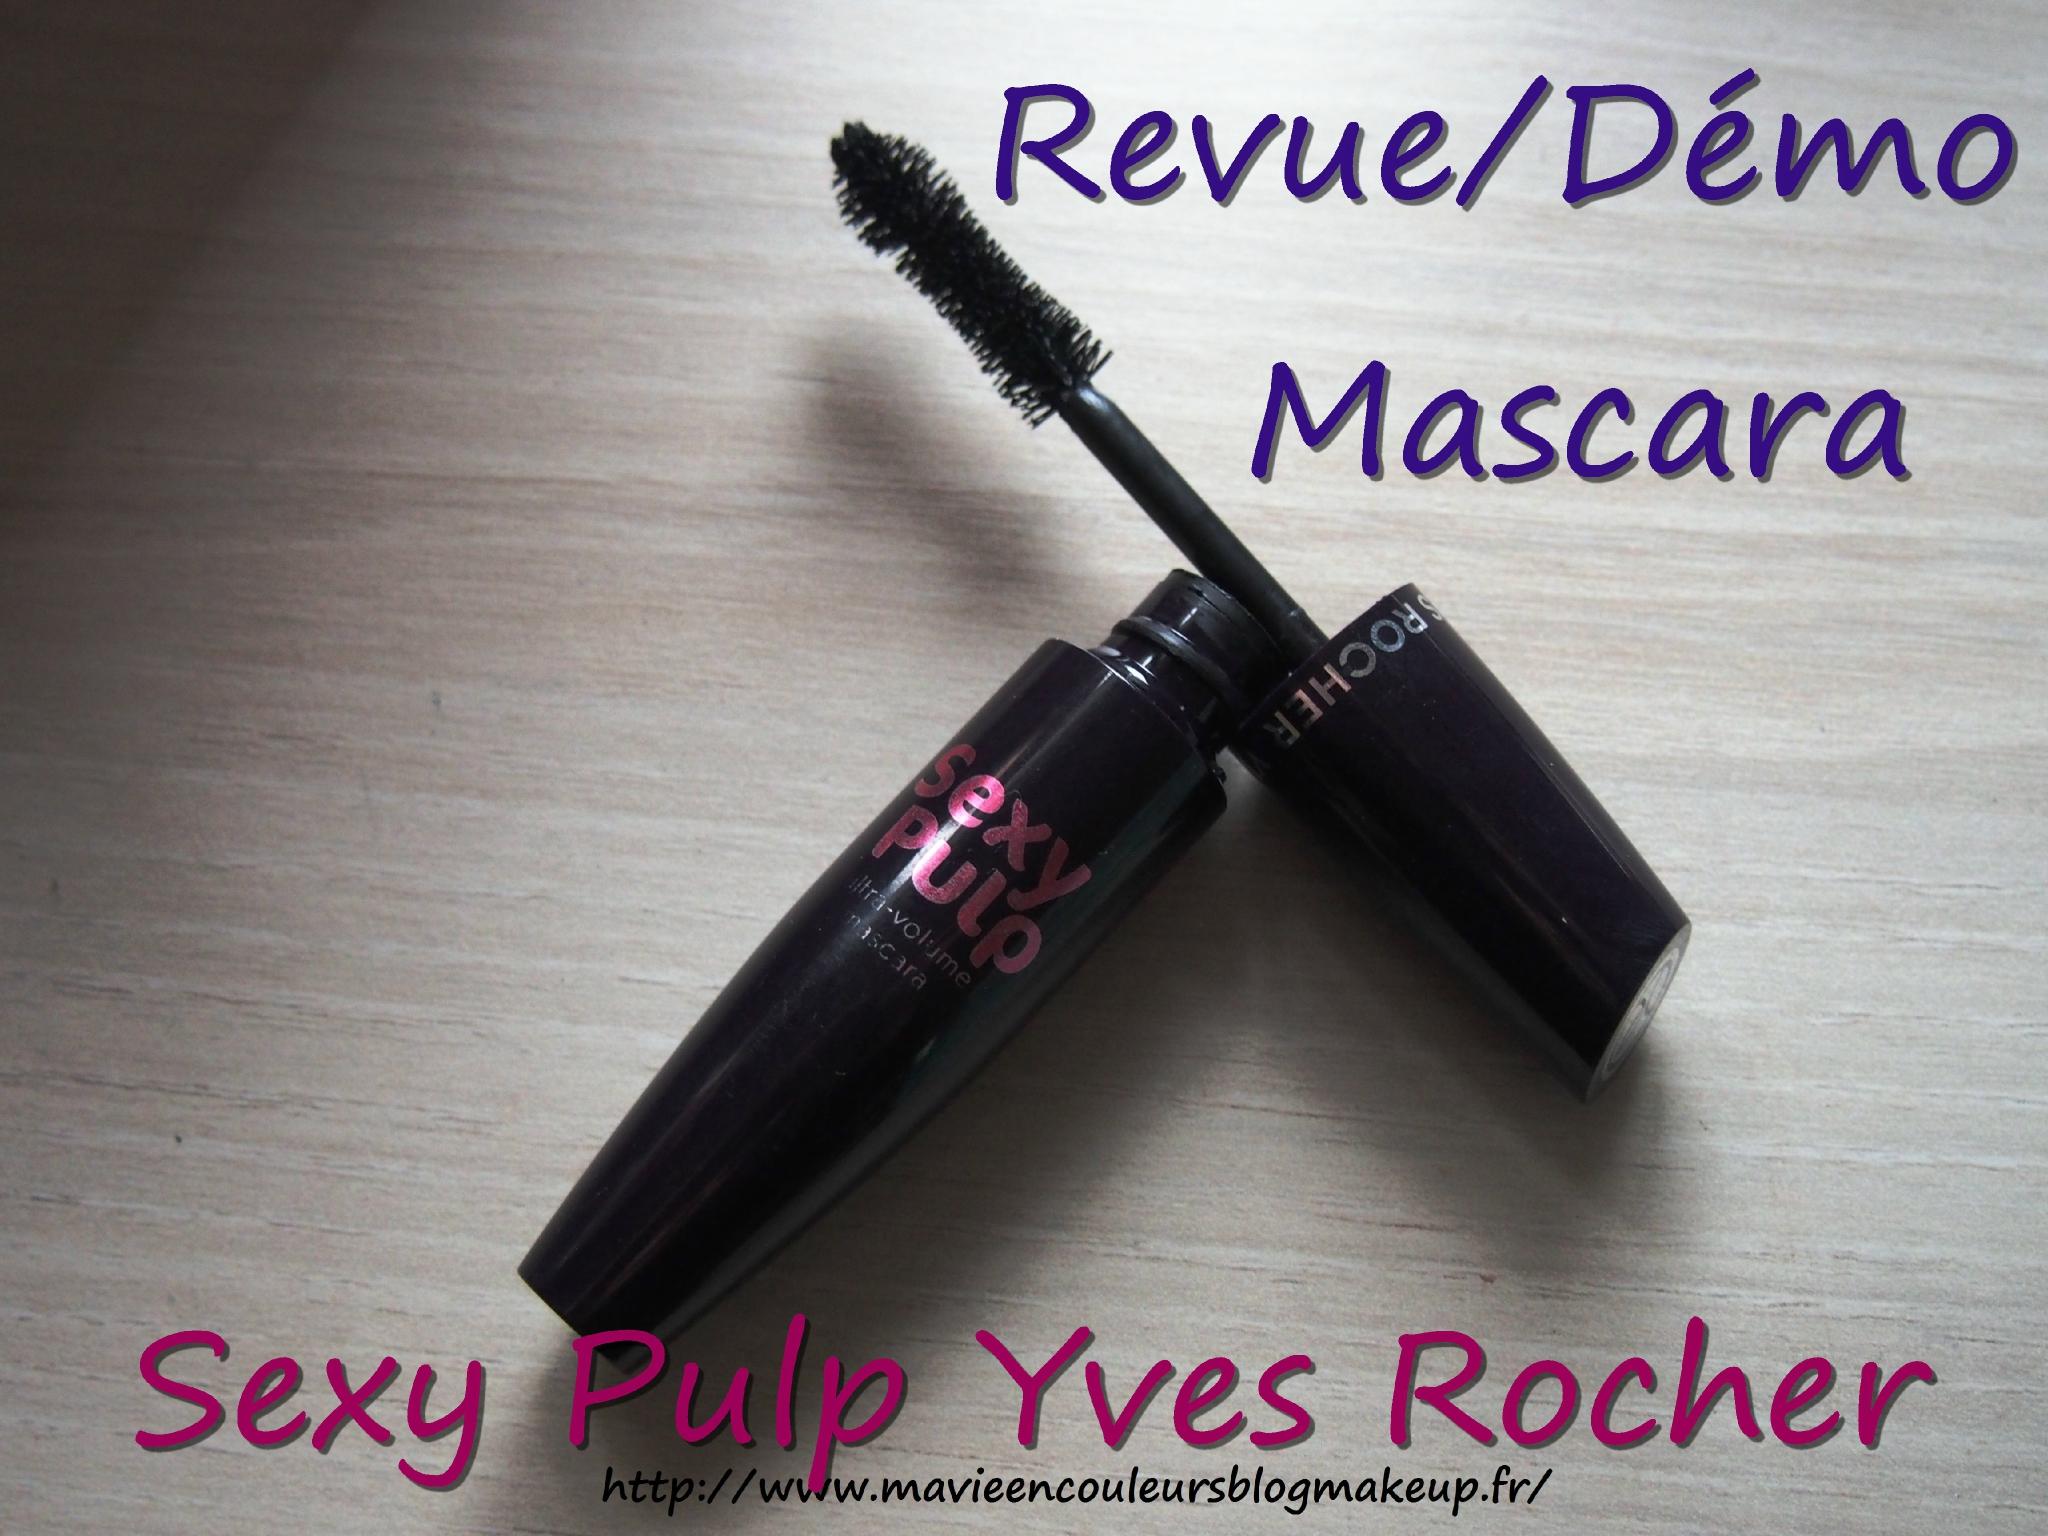 Revue/Démo: Mascara sexy pulp yves rocher.